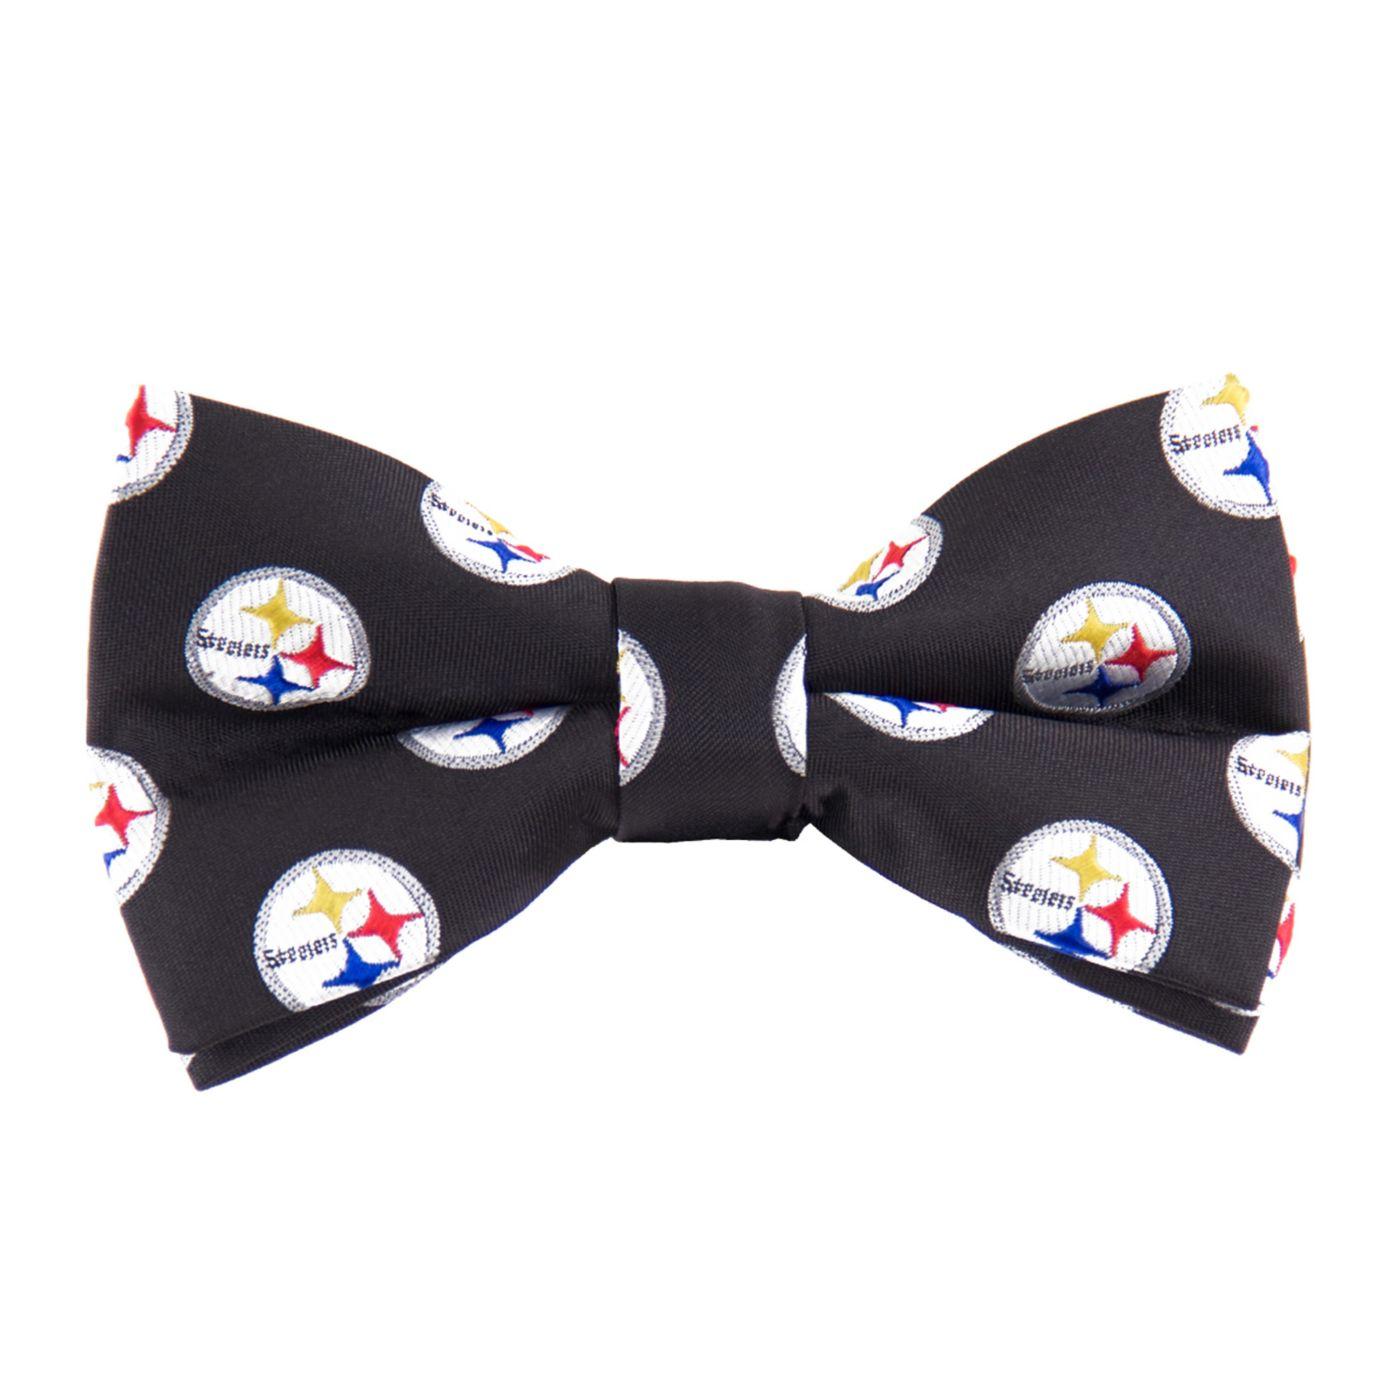 Eagles Wings Pittsburgh Steelers Repeat Bow Tie